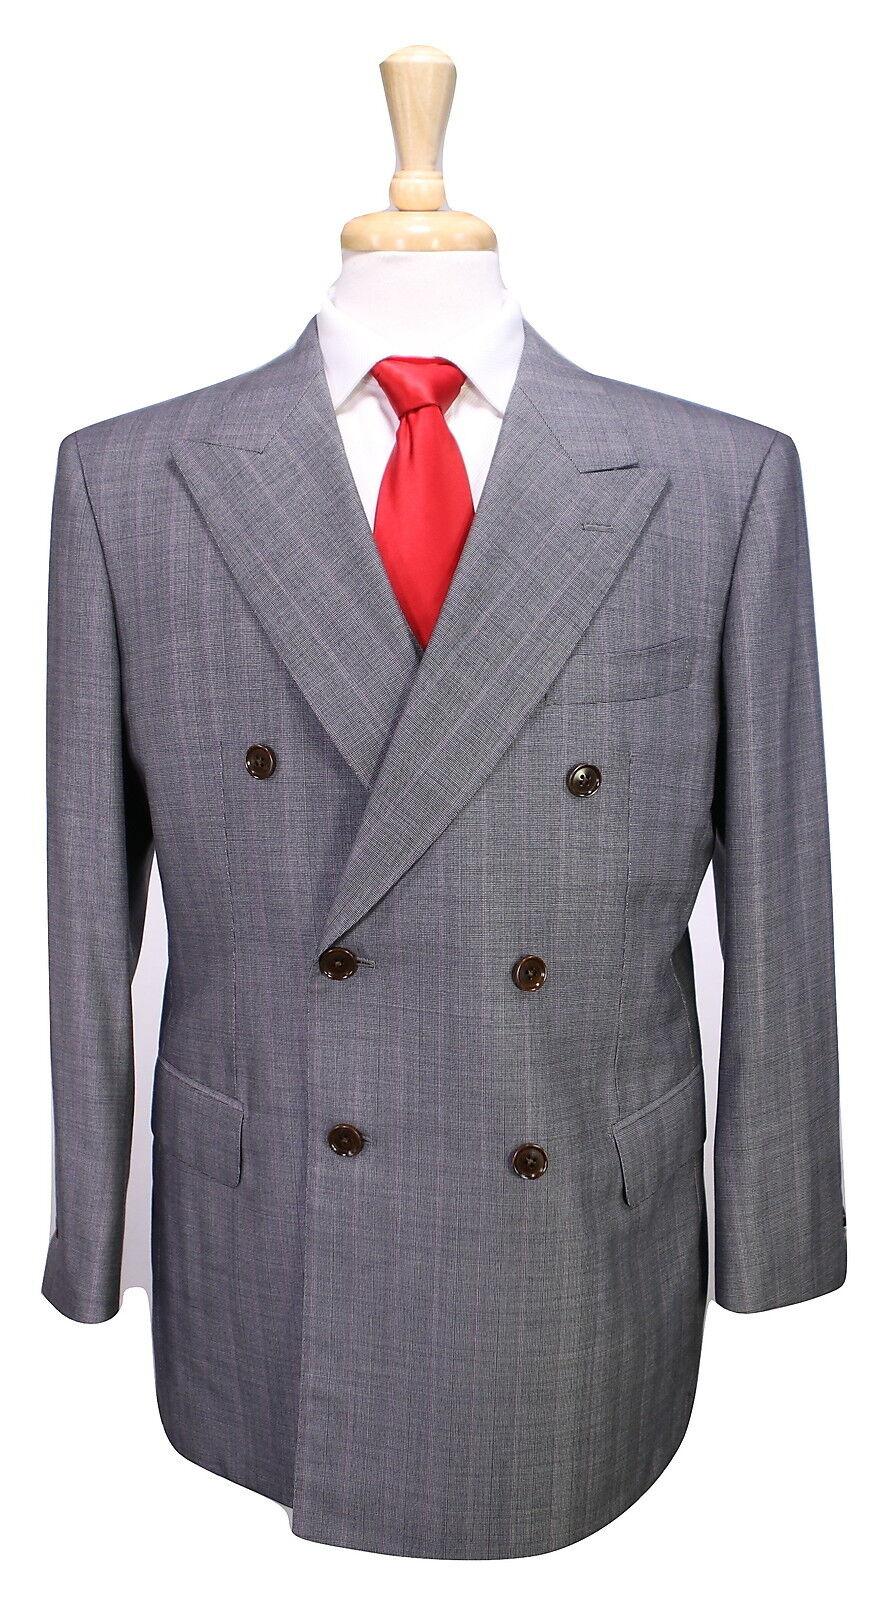 SARTORIA MAXSY Japan Bespoke grau Striped Zegna 15 Milmil 15 3-Pc DB Suit 40S